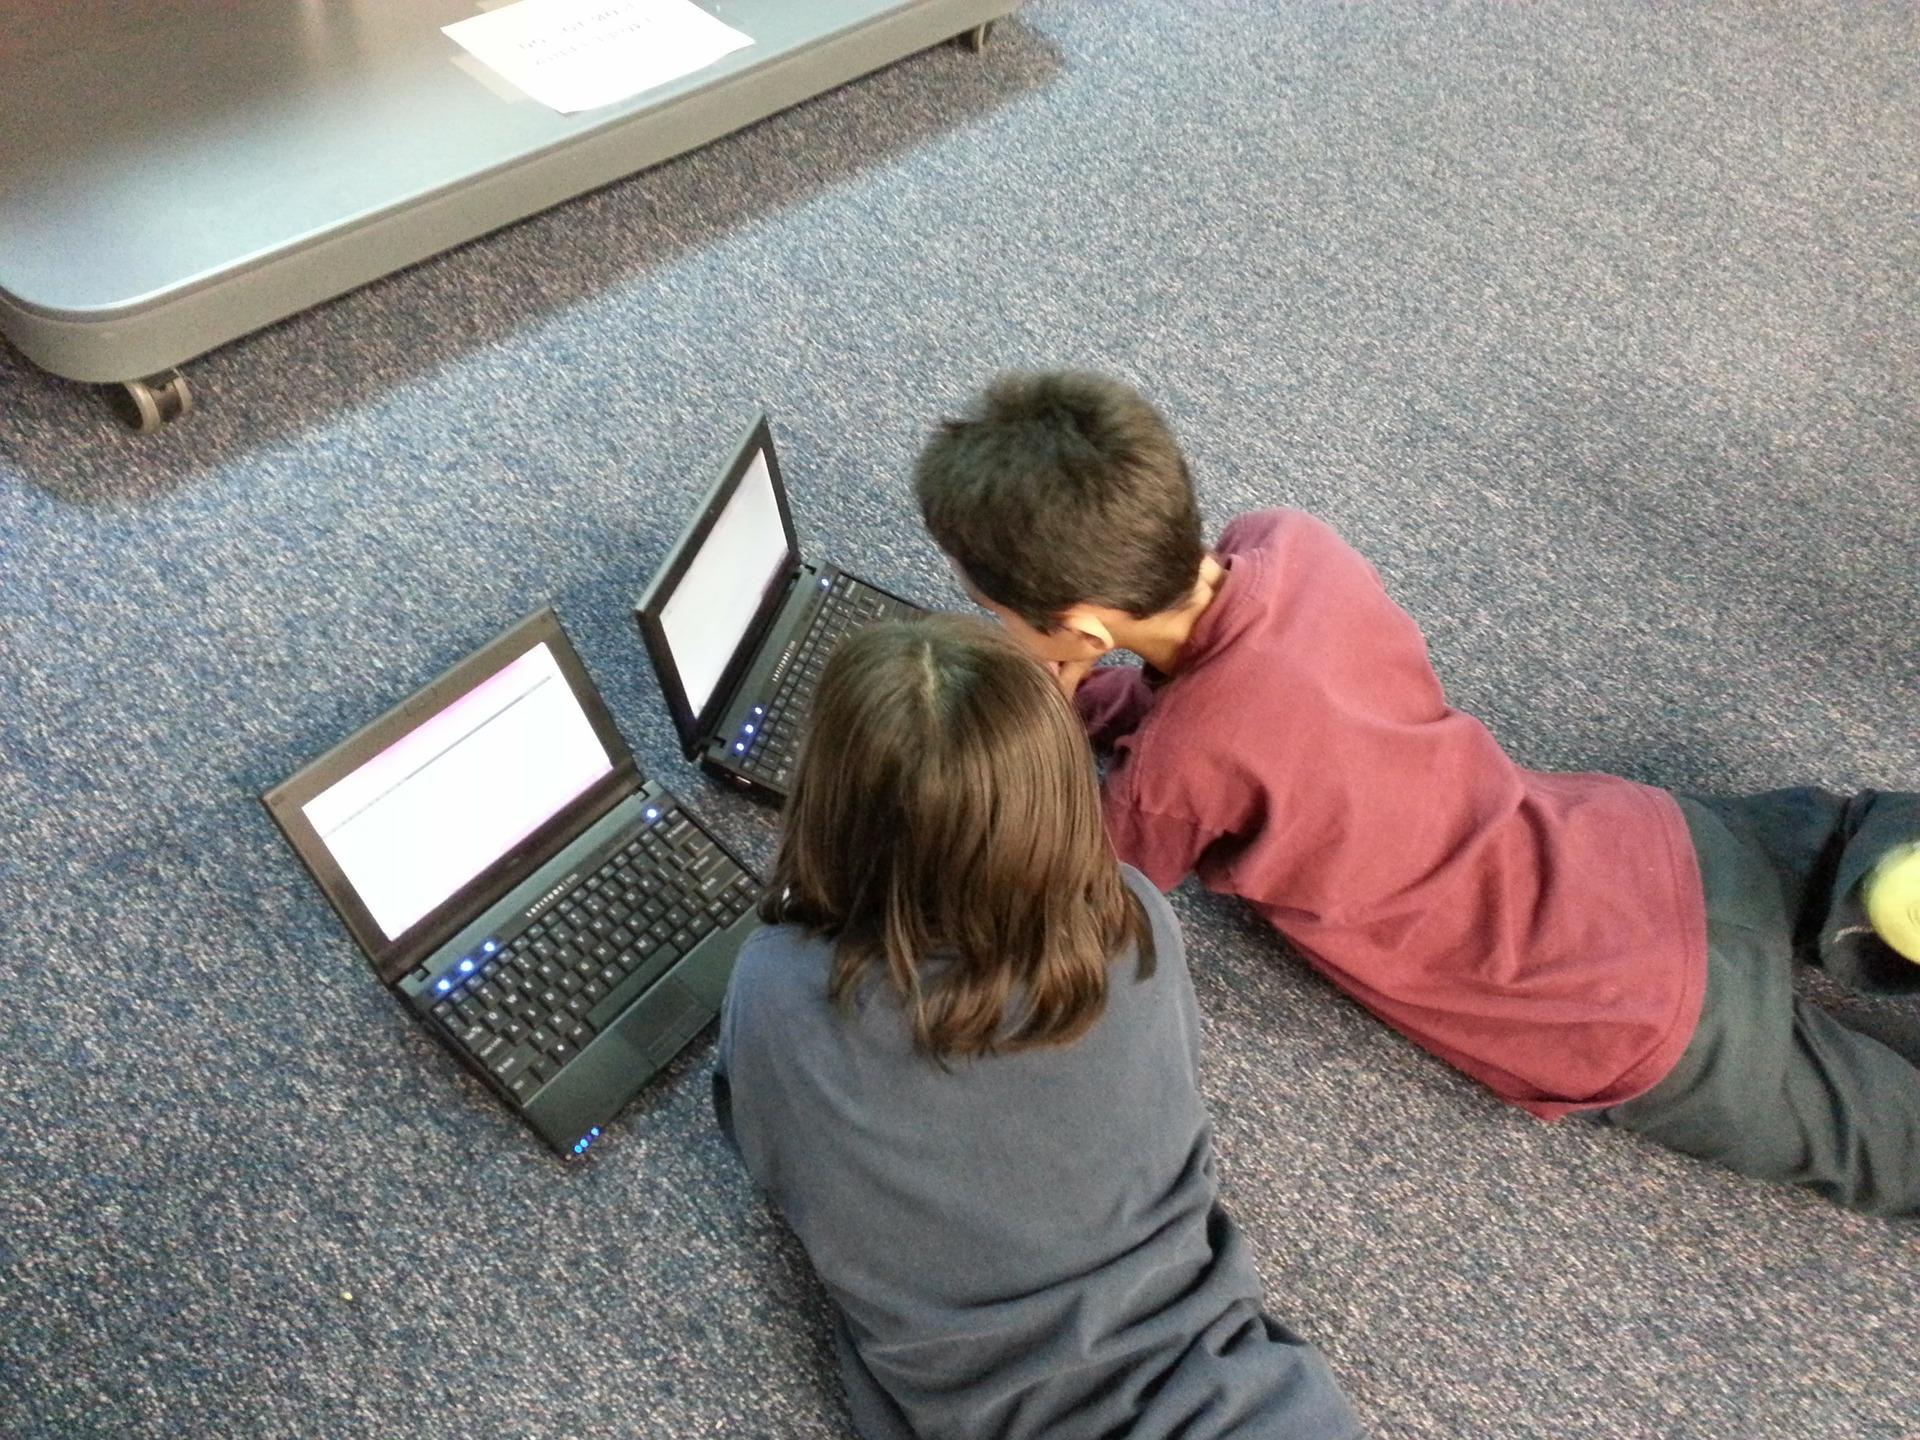 boy-laptop.jpg